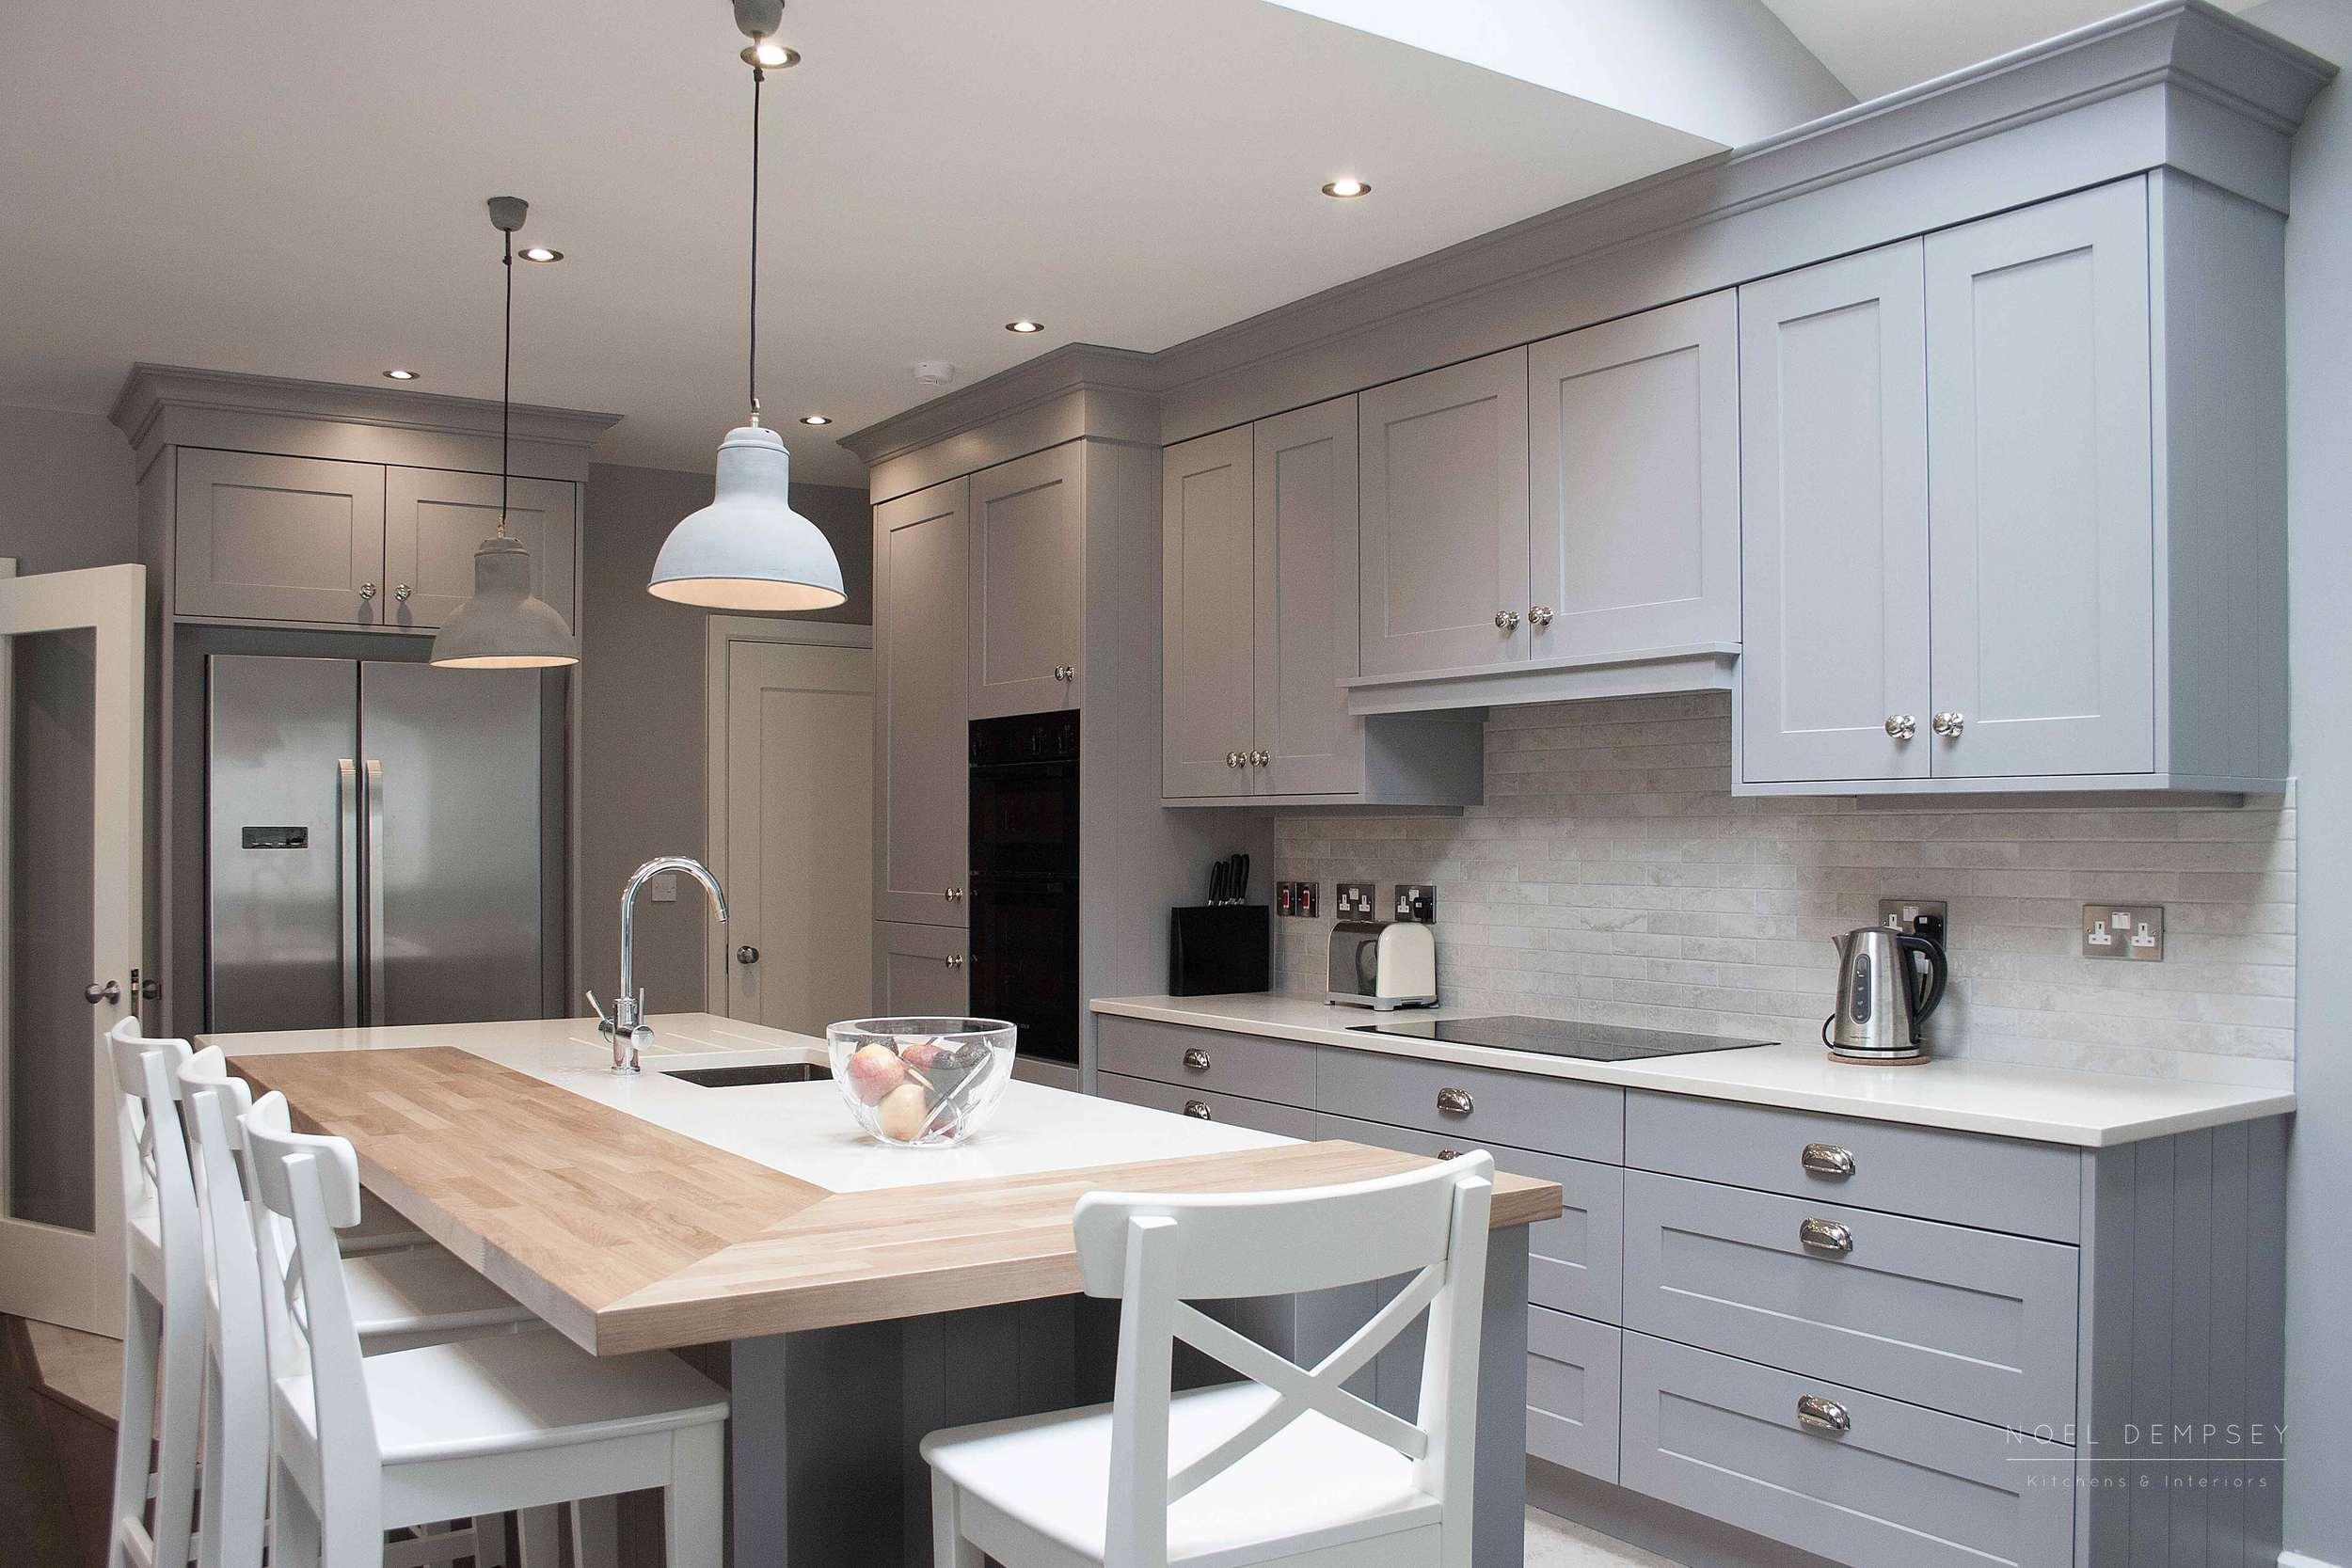 Mount-Anville-Kitchen-Dublin-1.jpg